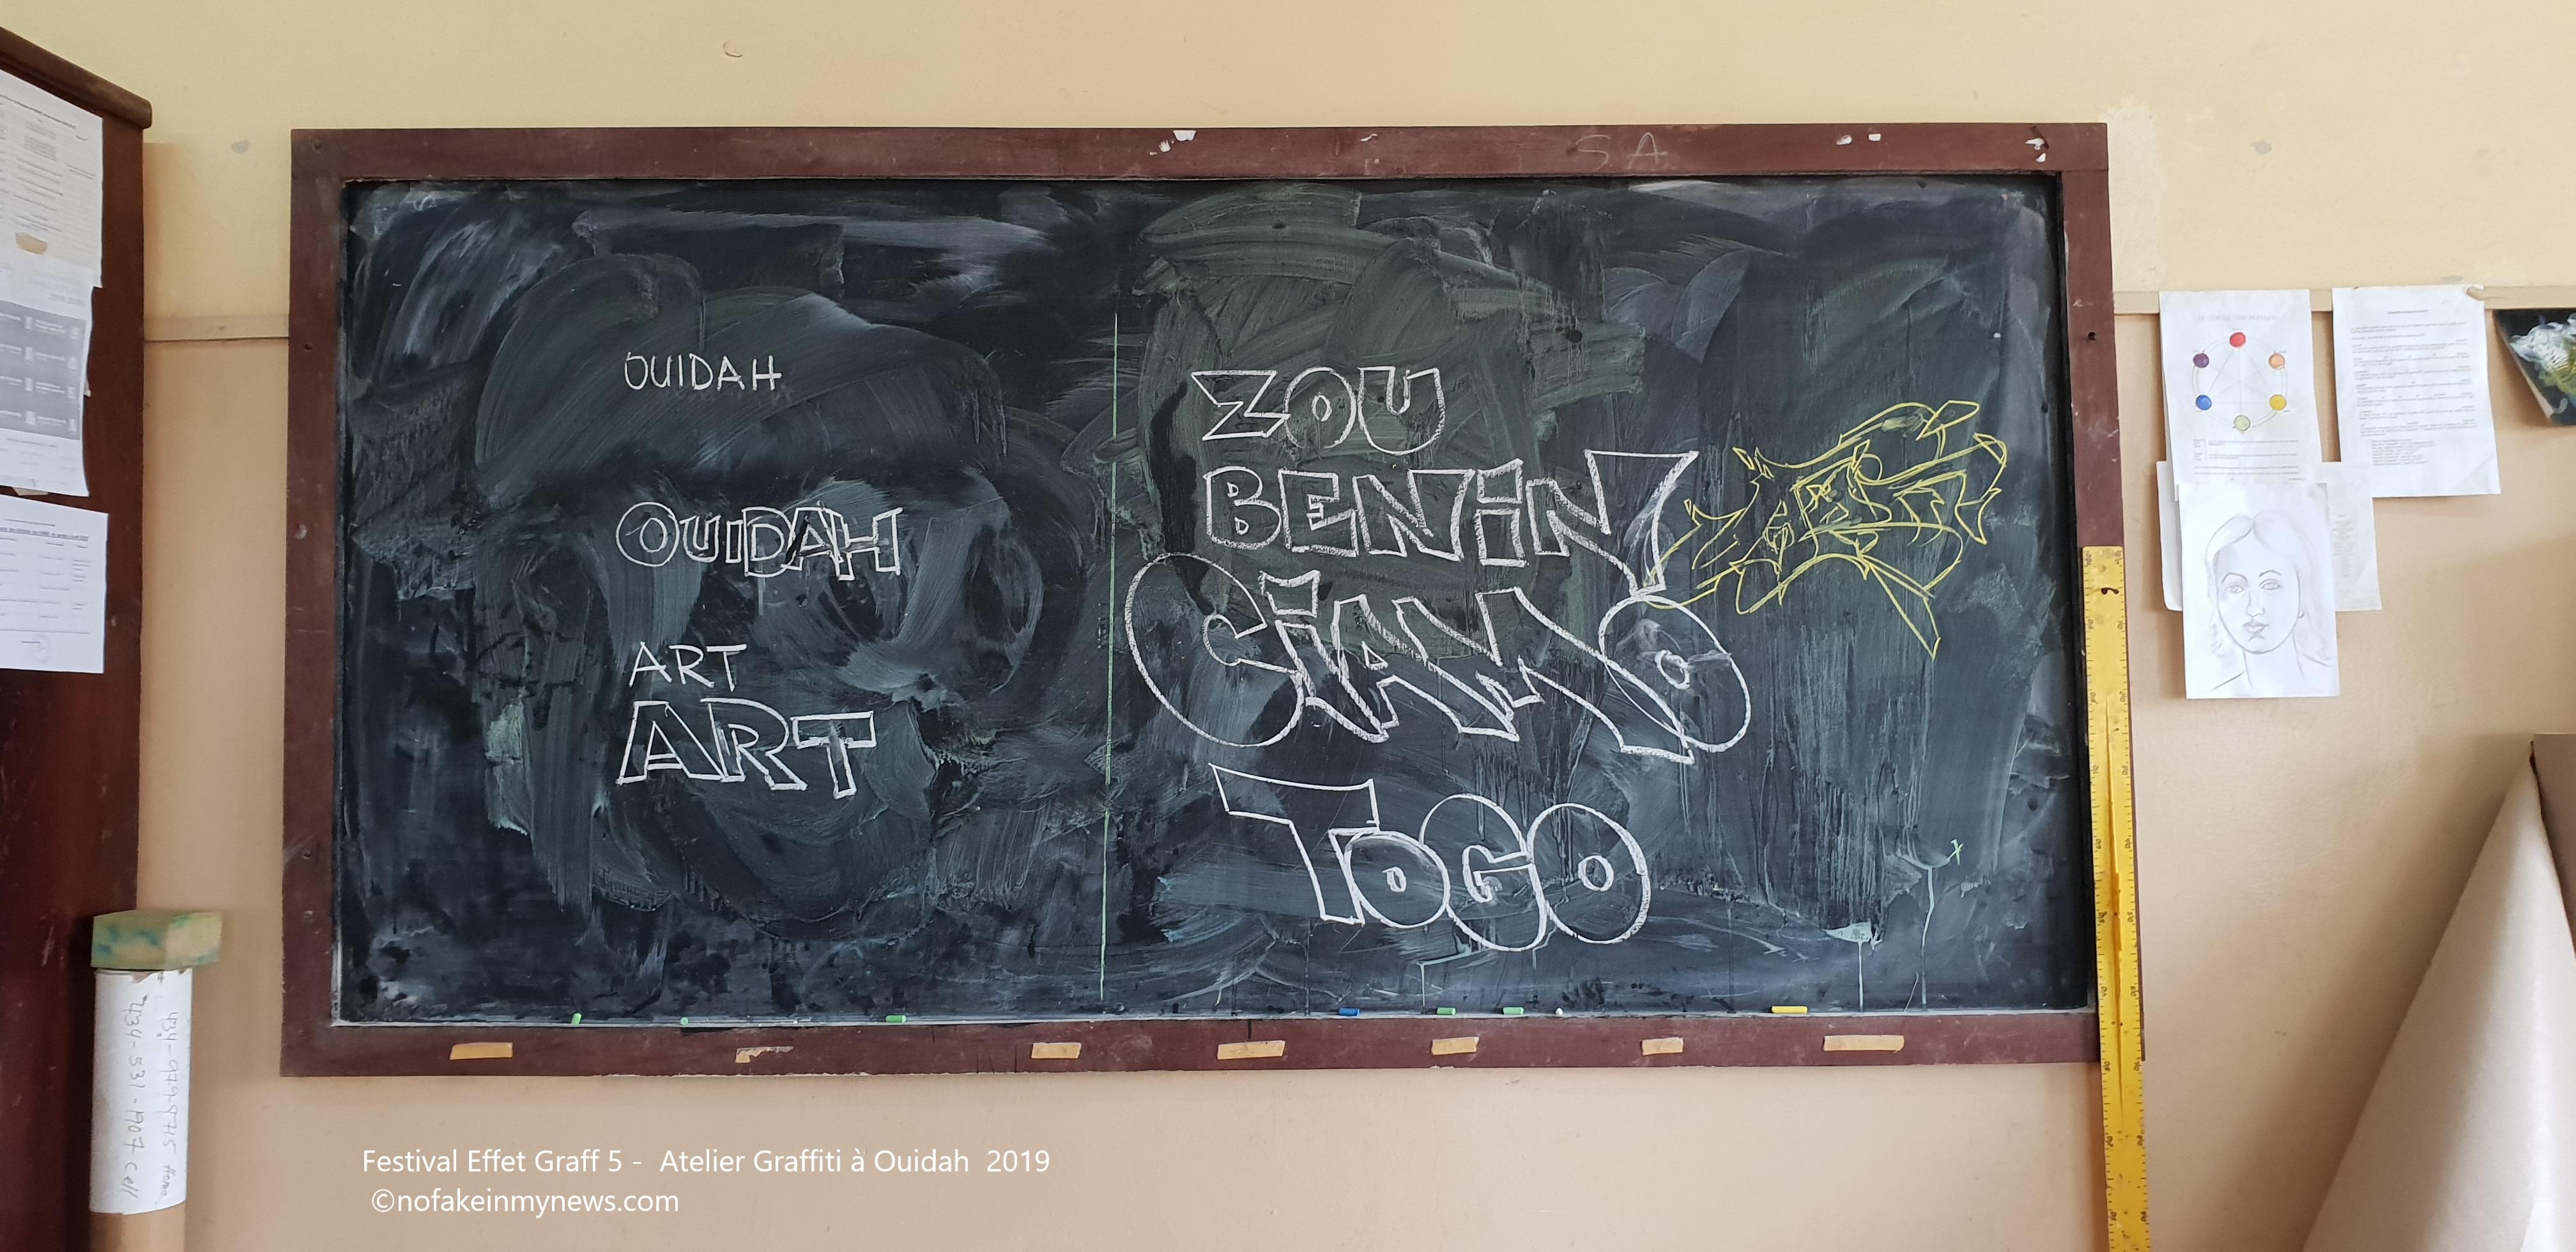 Festival Effet Graff 5 - Atelier Graffiti à Ouidah 2019 ©nofakeinmynews